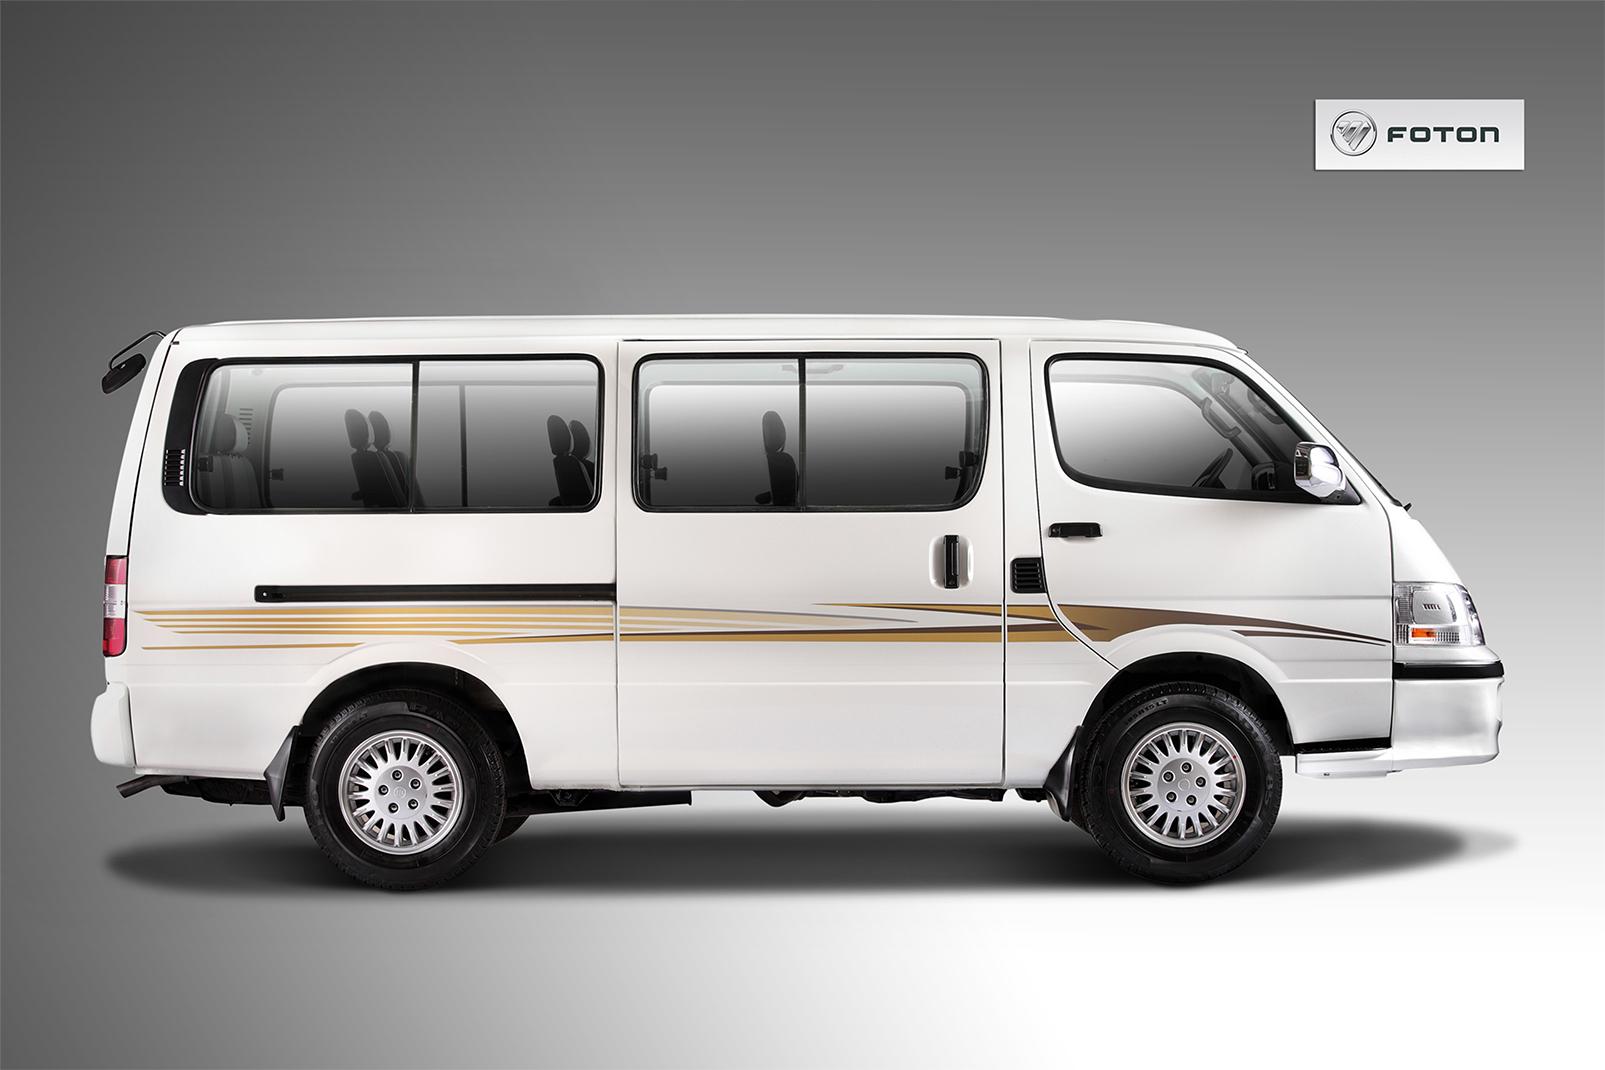 Foton, VIEW Microbus